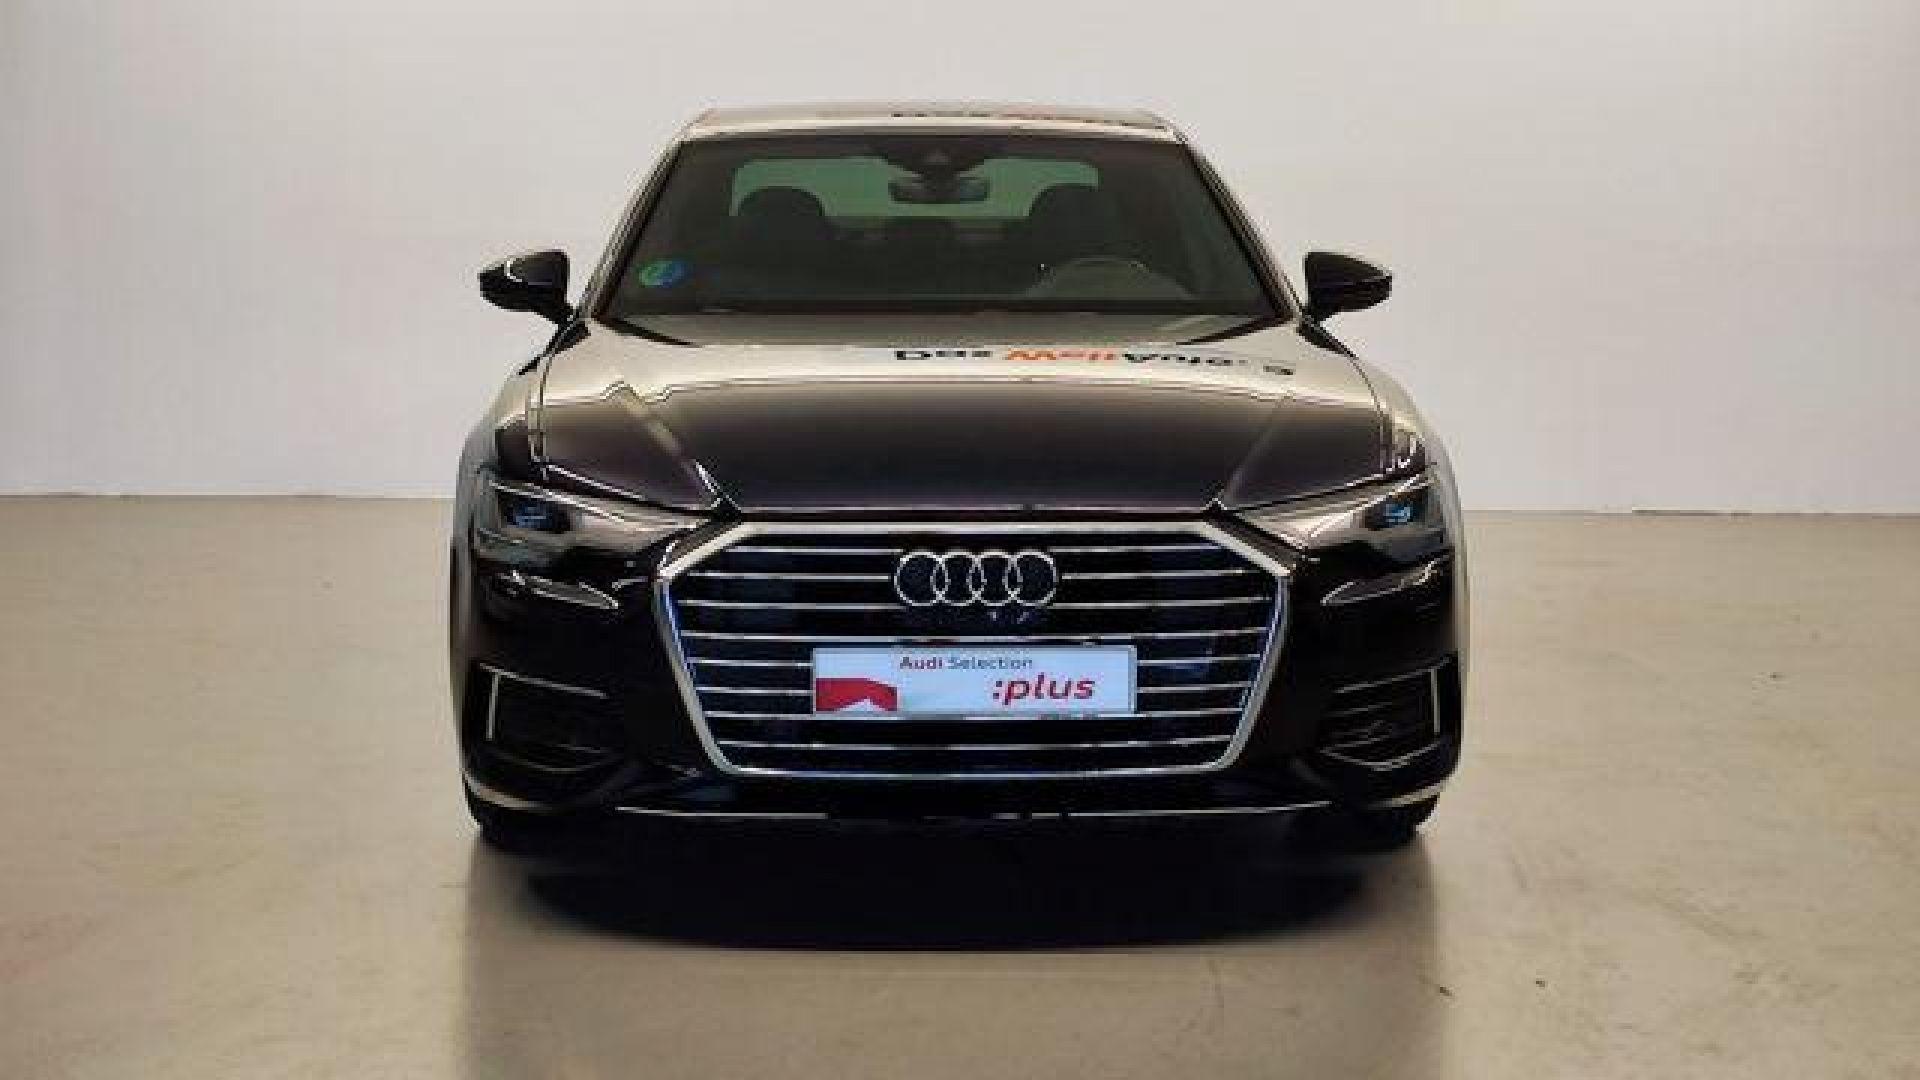 Audi A6 design 40 TDI 150 kW (204 CV) S tronic